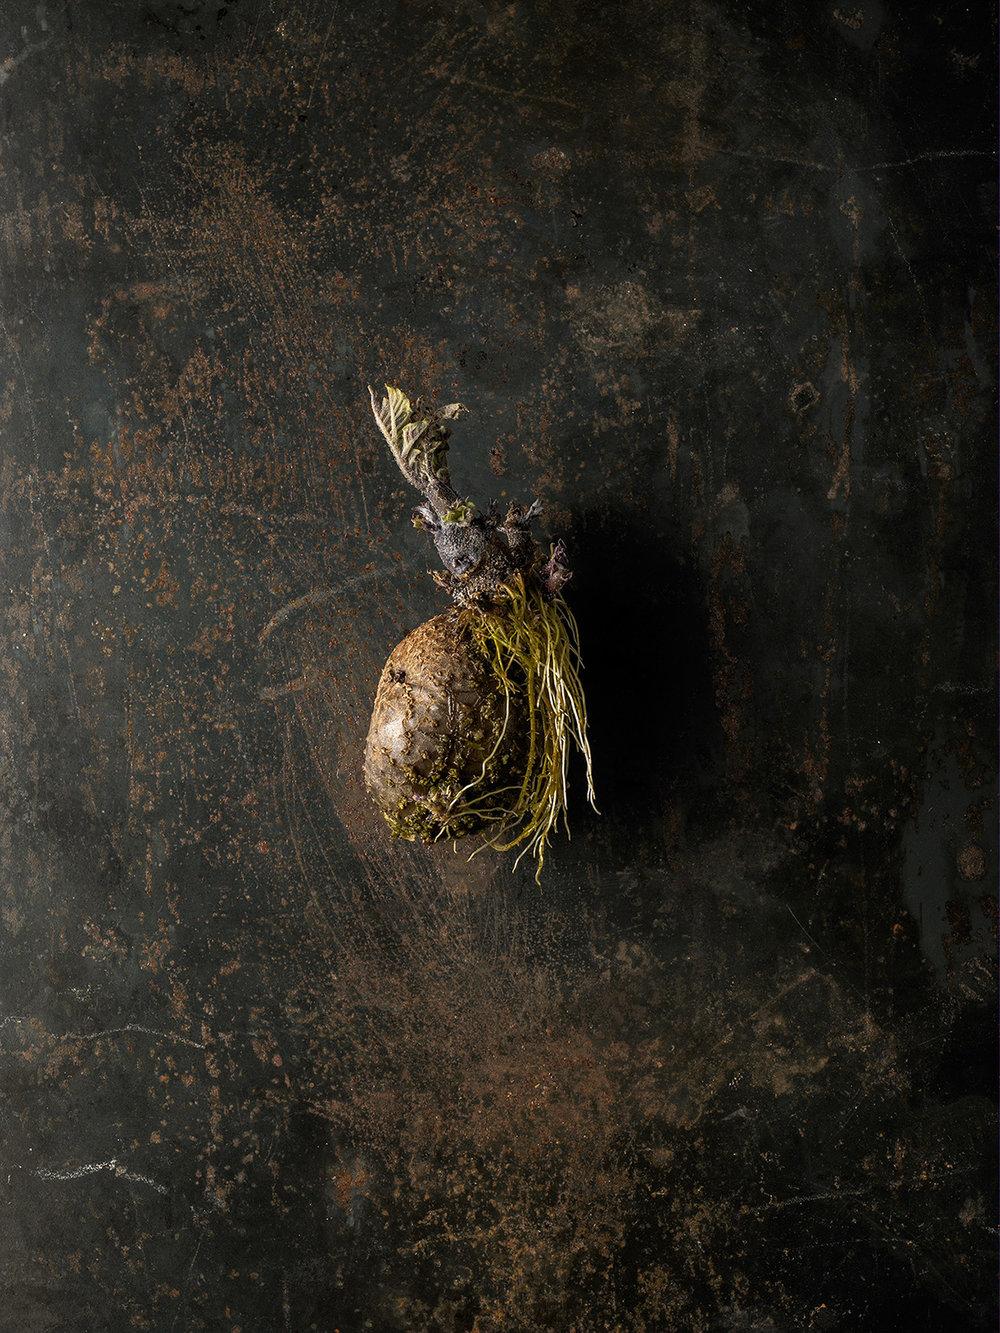 52_Beth_Galton_Roots_Yukon_Gold_Potato_6.jpg